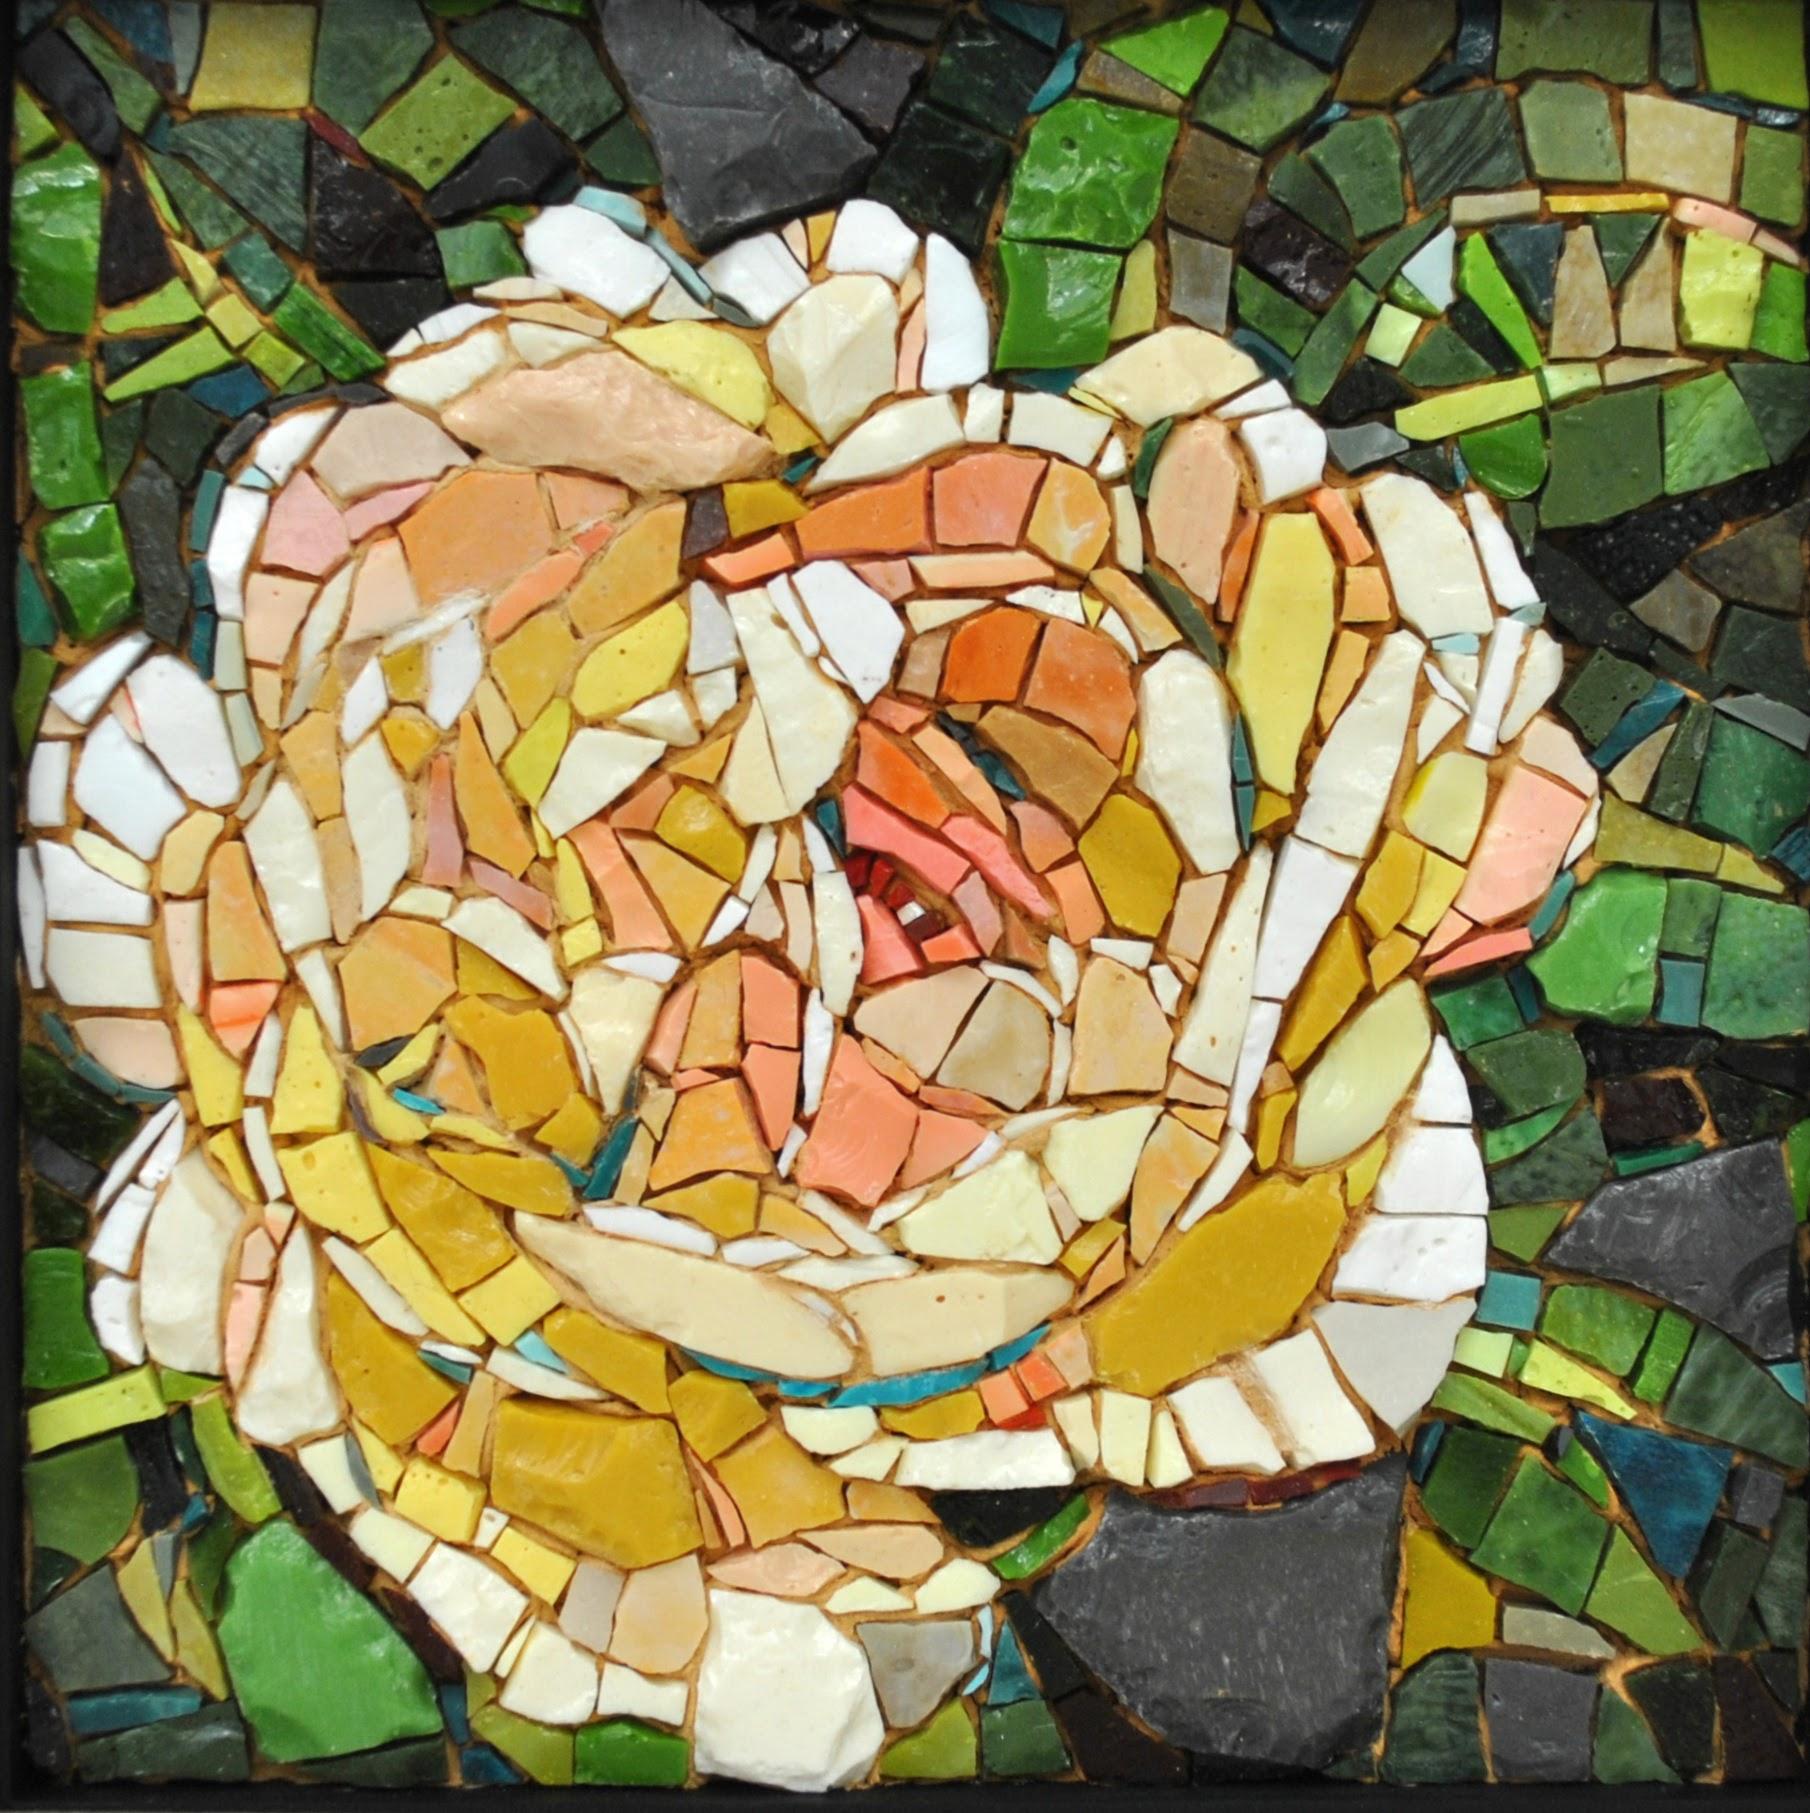 https://www.brendapokornymosaics.com/flowers